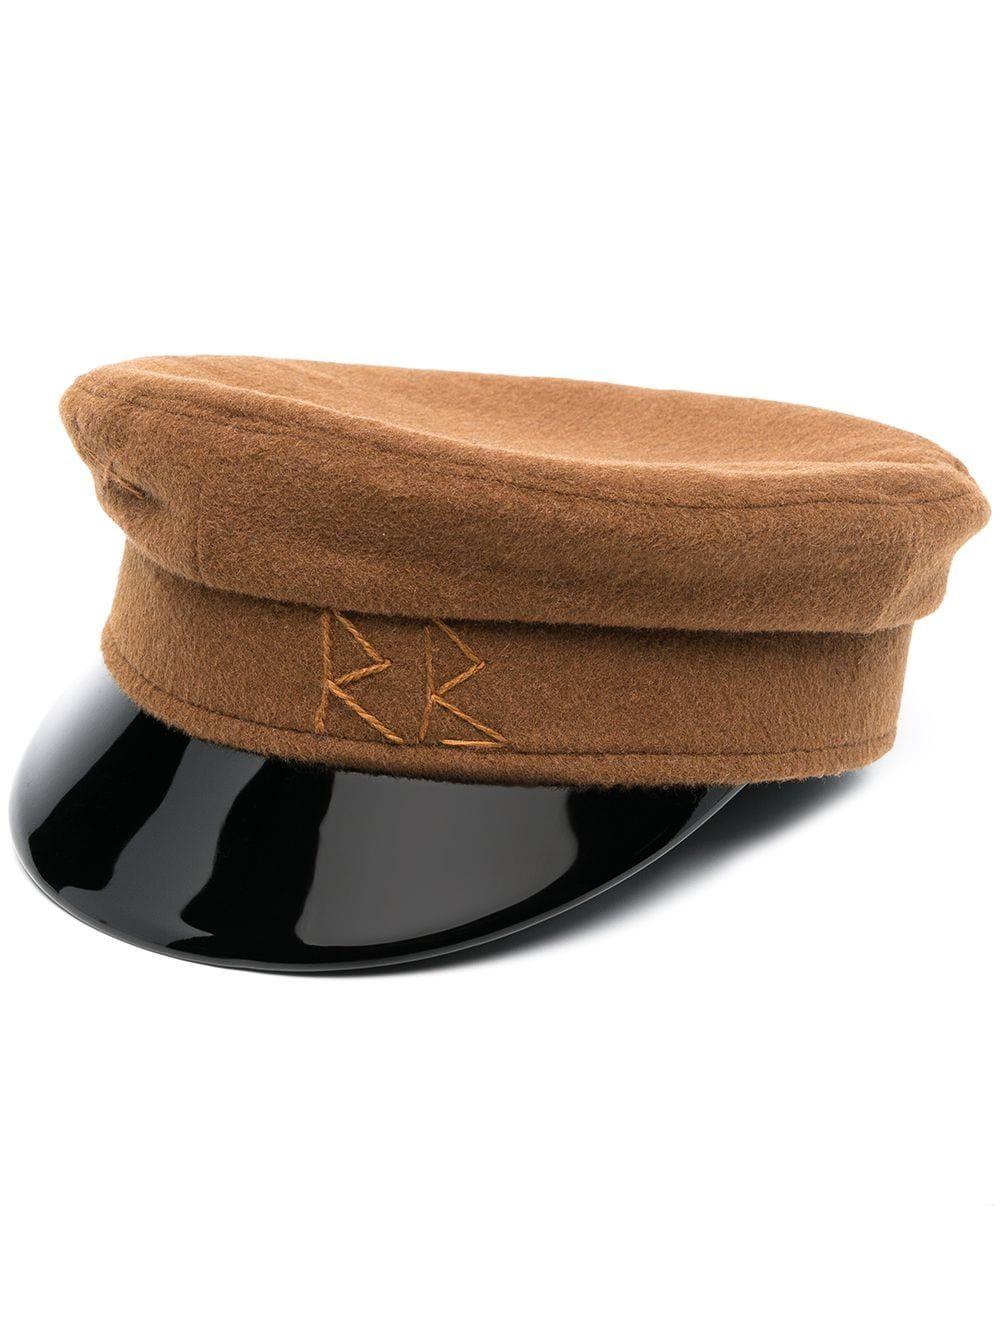 Cappello baker boy in lana